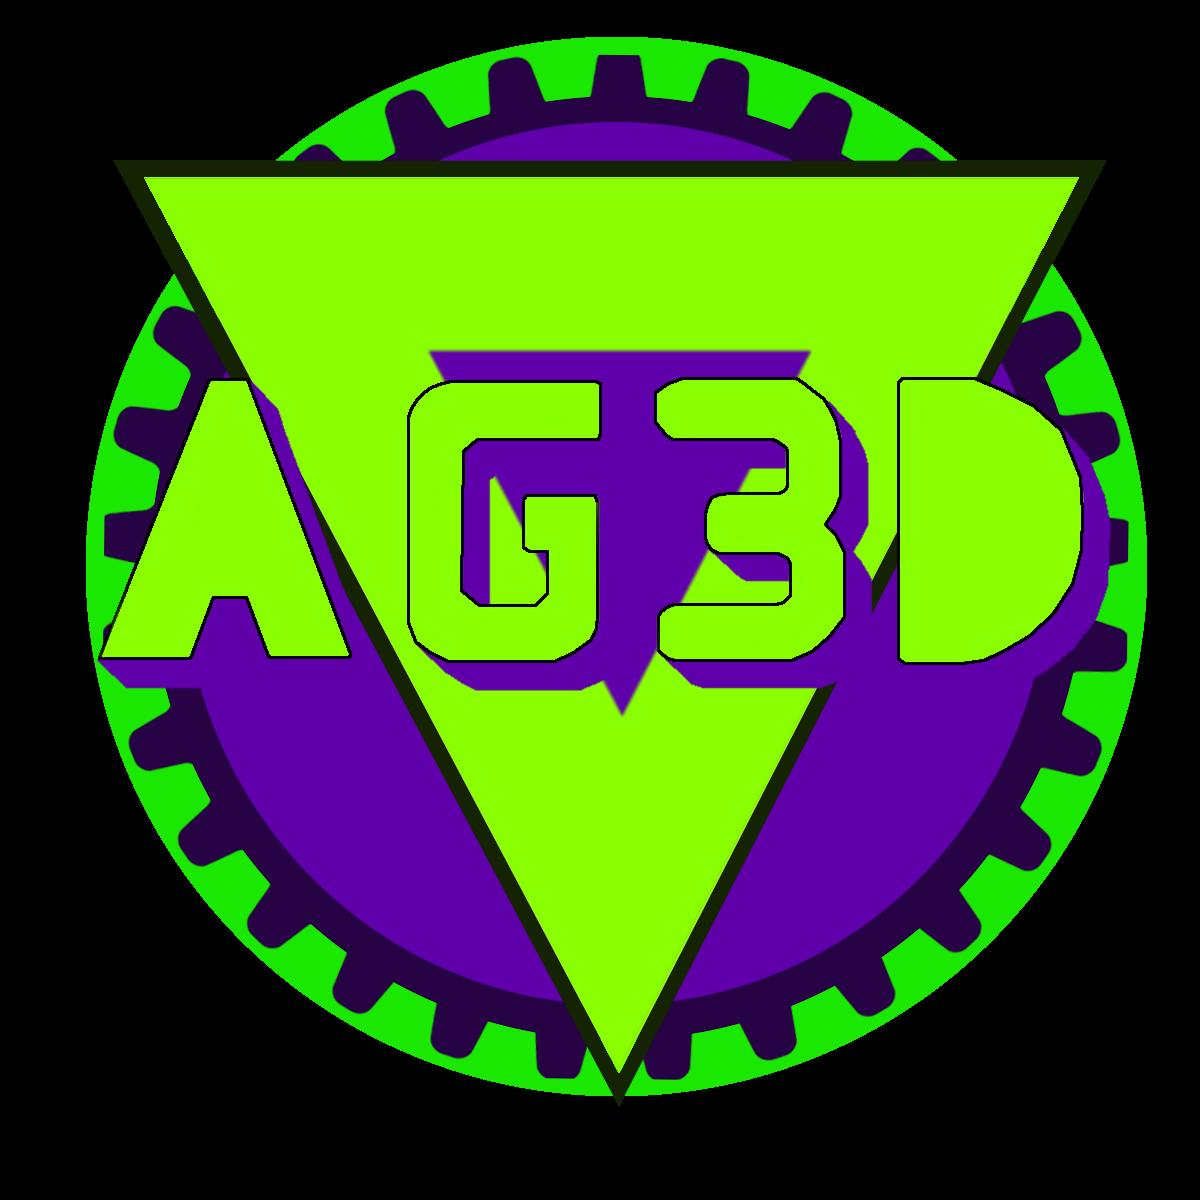 AG3DengineeringLOGO.png